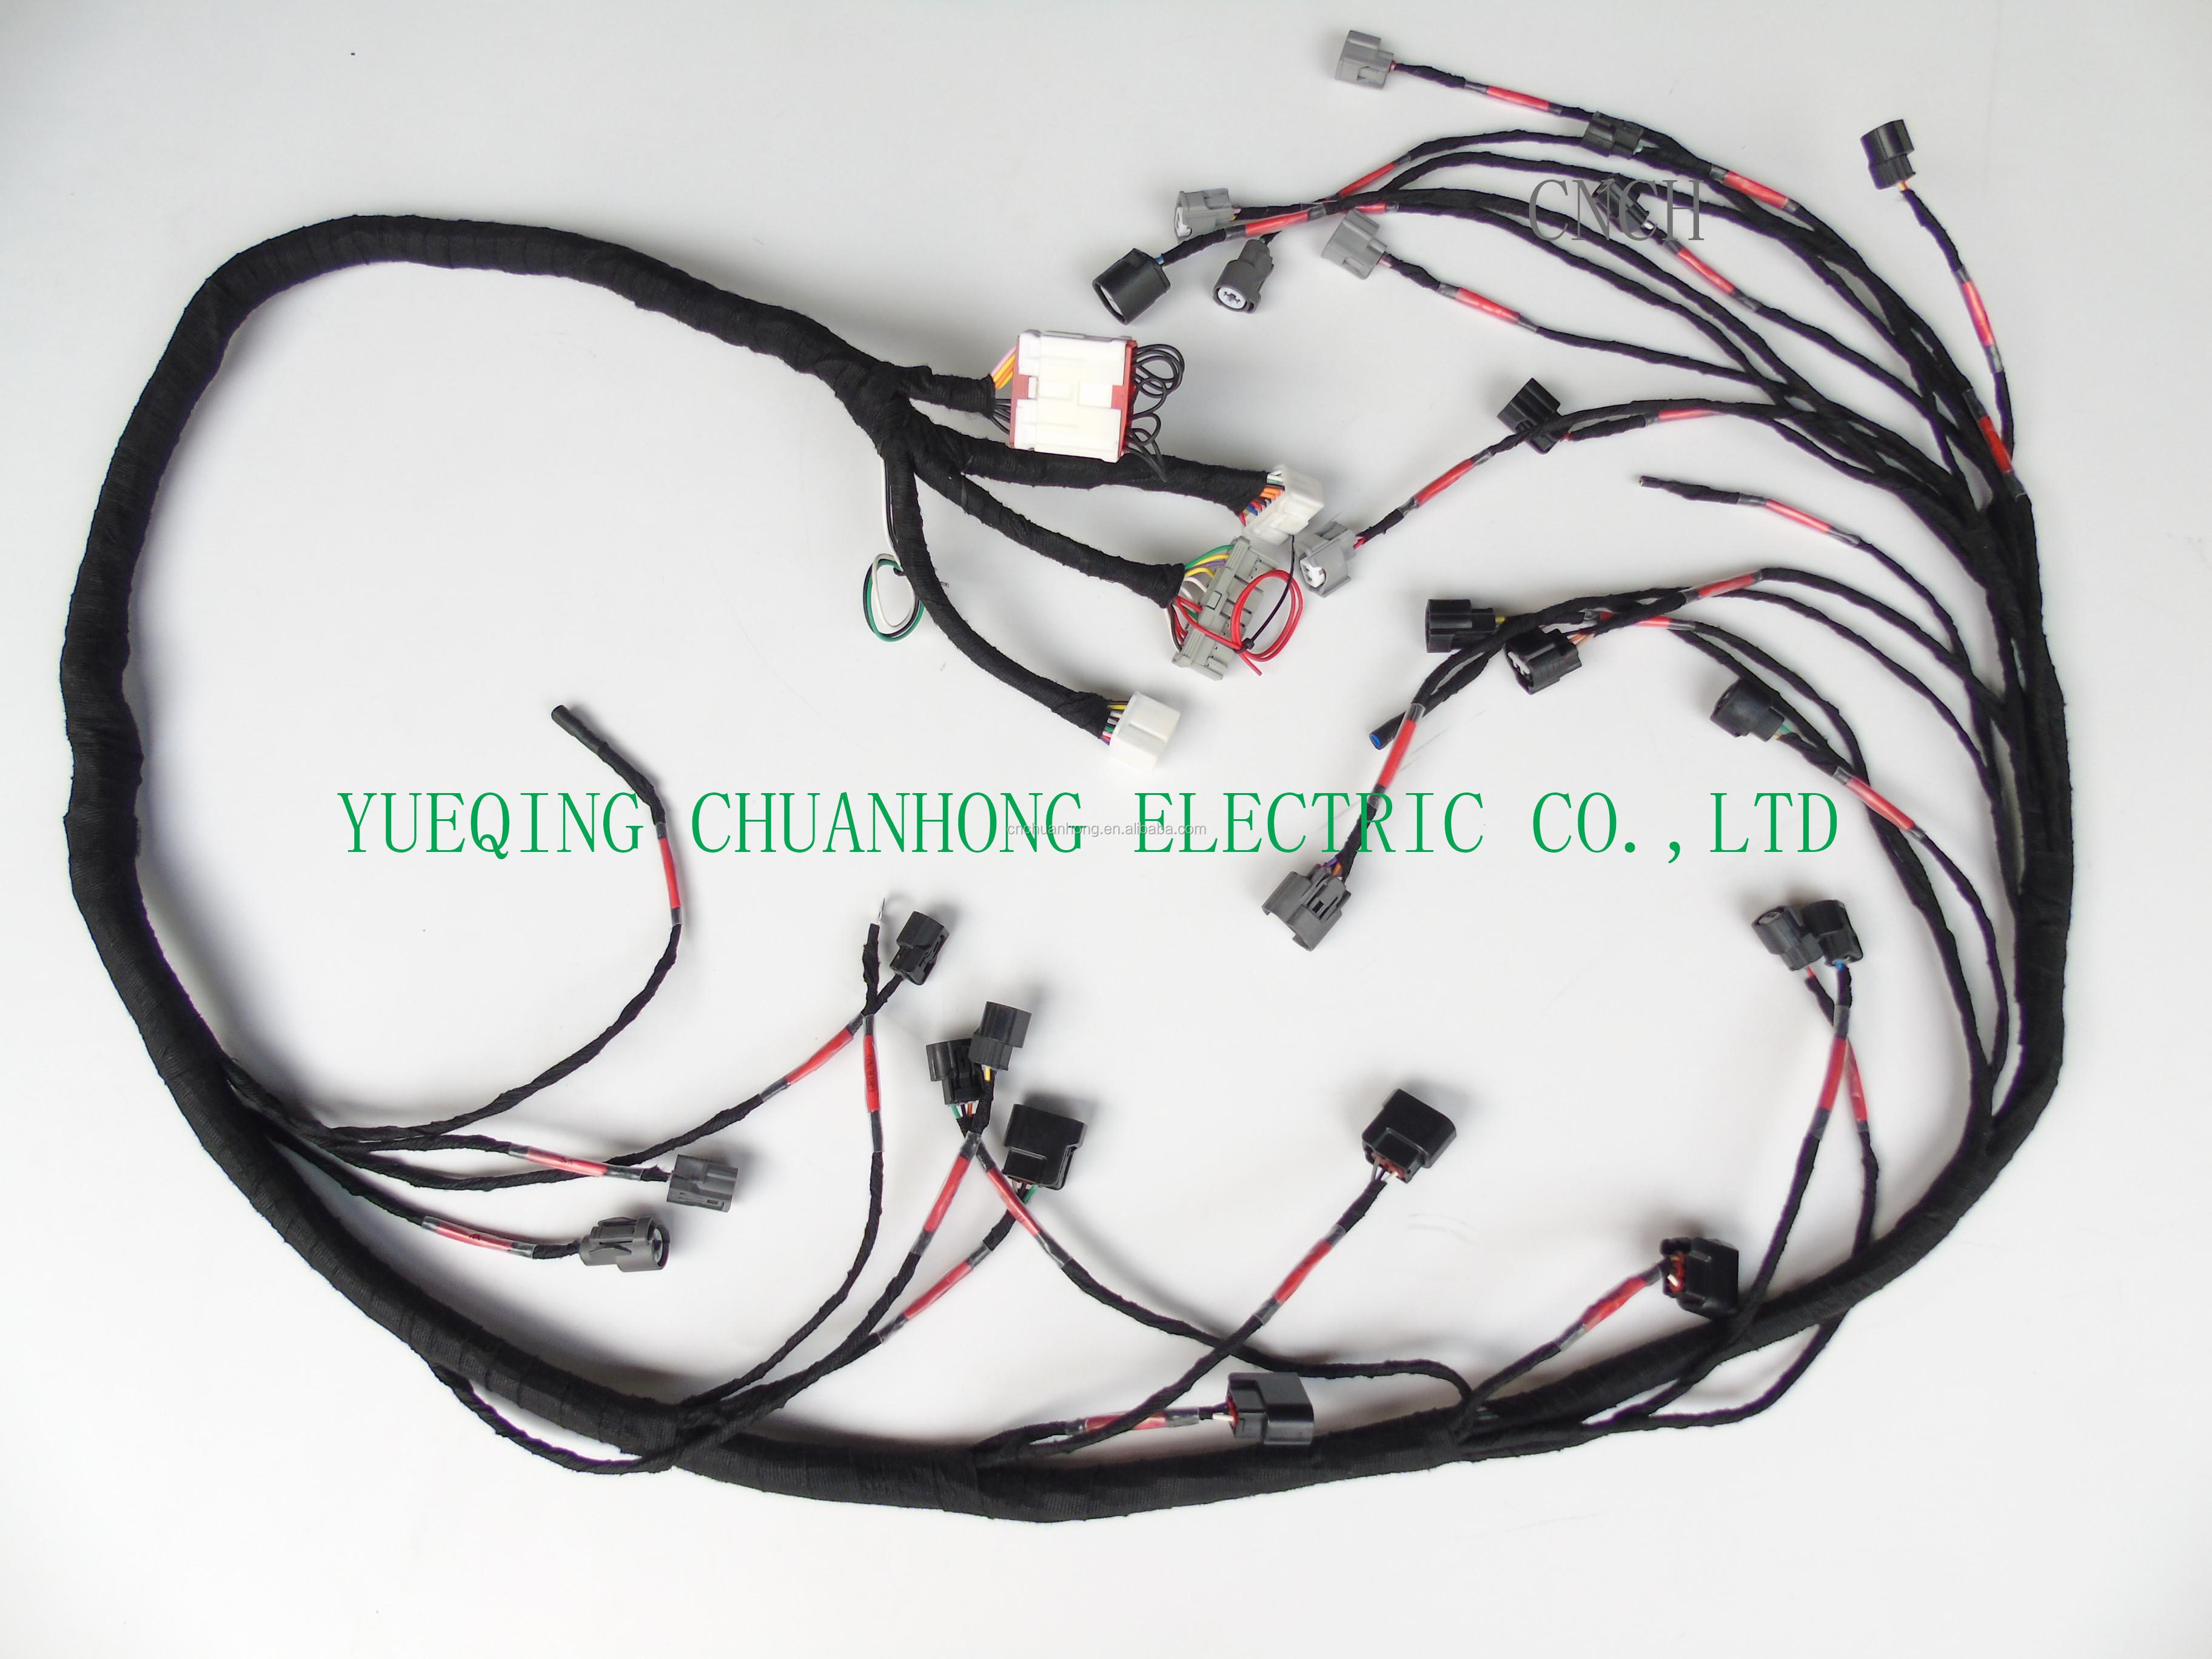 [ZTBE_9966]  K20 K20a2 K-series Tucked Engine Harness For Honda Acura Toyota Mr2 K-swap  - Buy 02-04 Rsx Type-s Harness,Rsx Base Or Ep3 With Type S Or K24 Swap,Wiring  Harness Product on Alibaba.com | K20 Mr2 Swap Wiring Harness |  | Alibaba.com